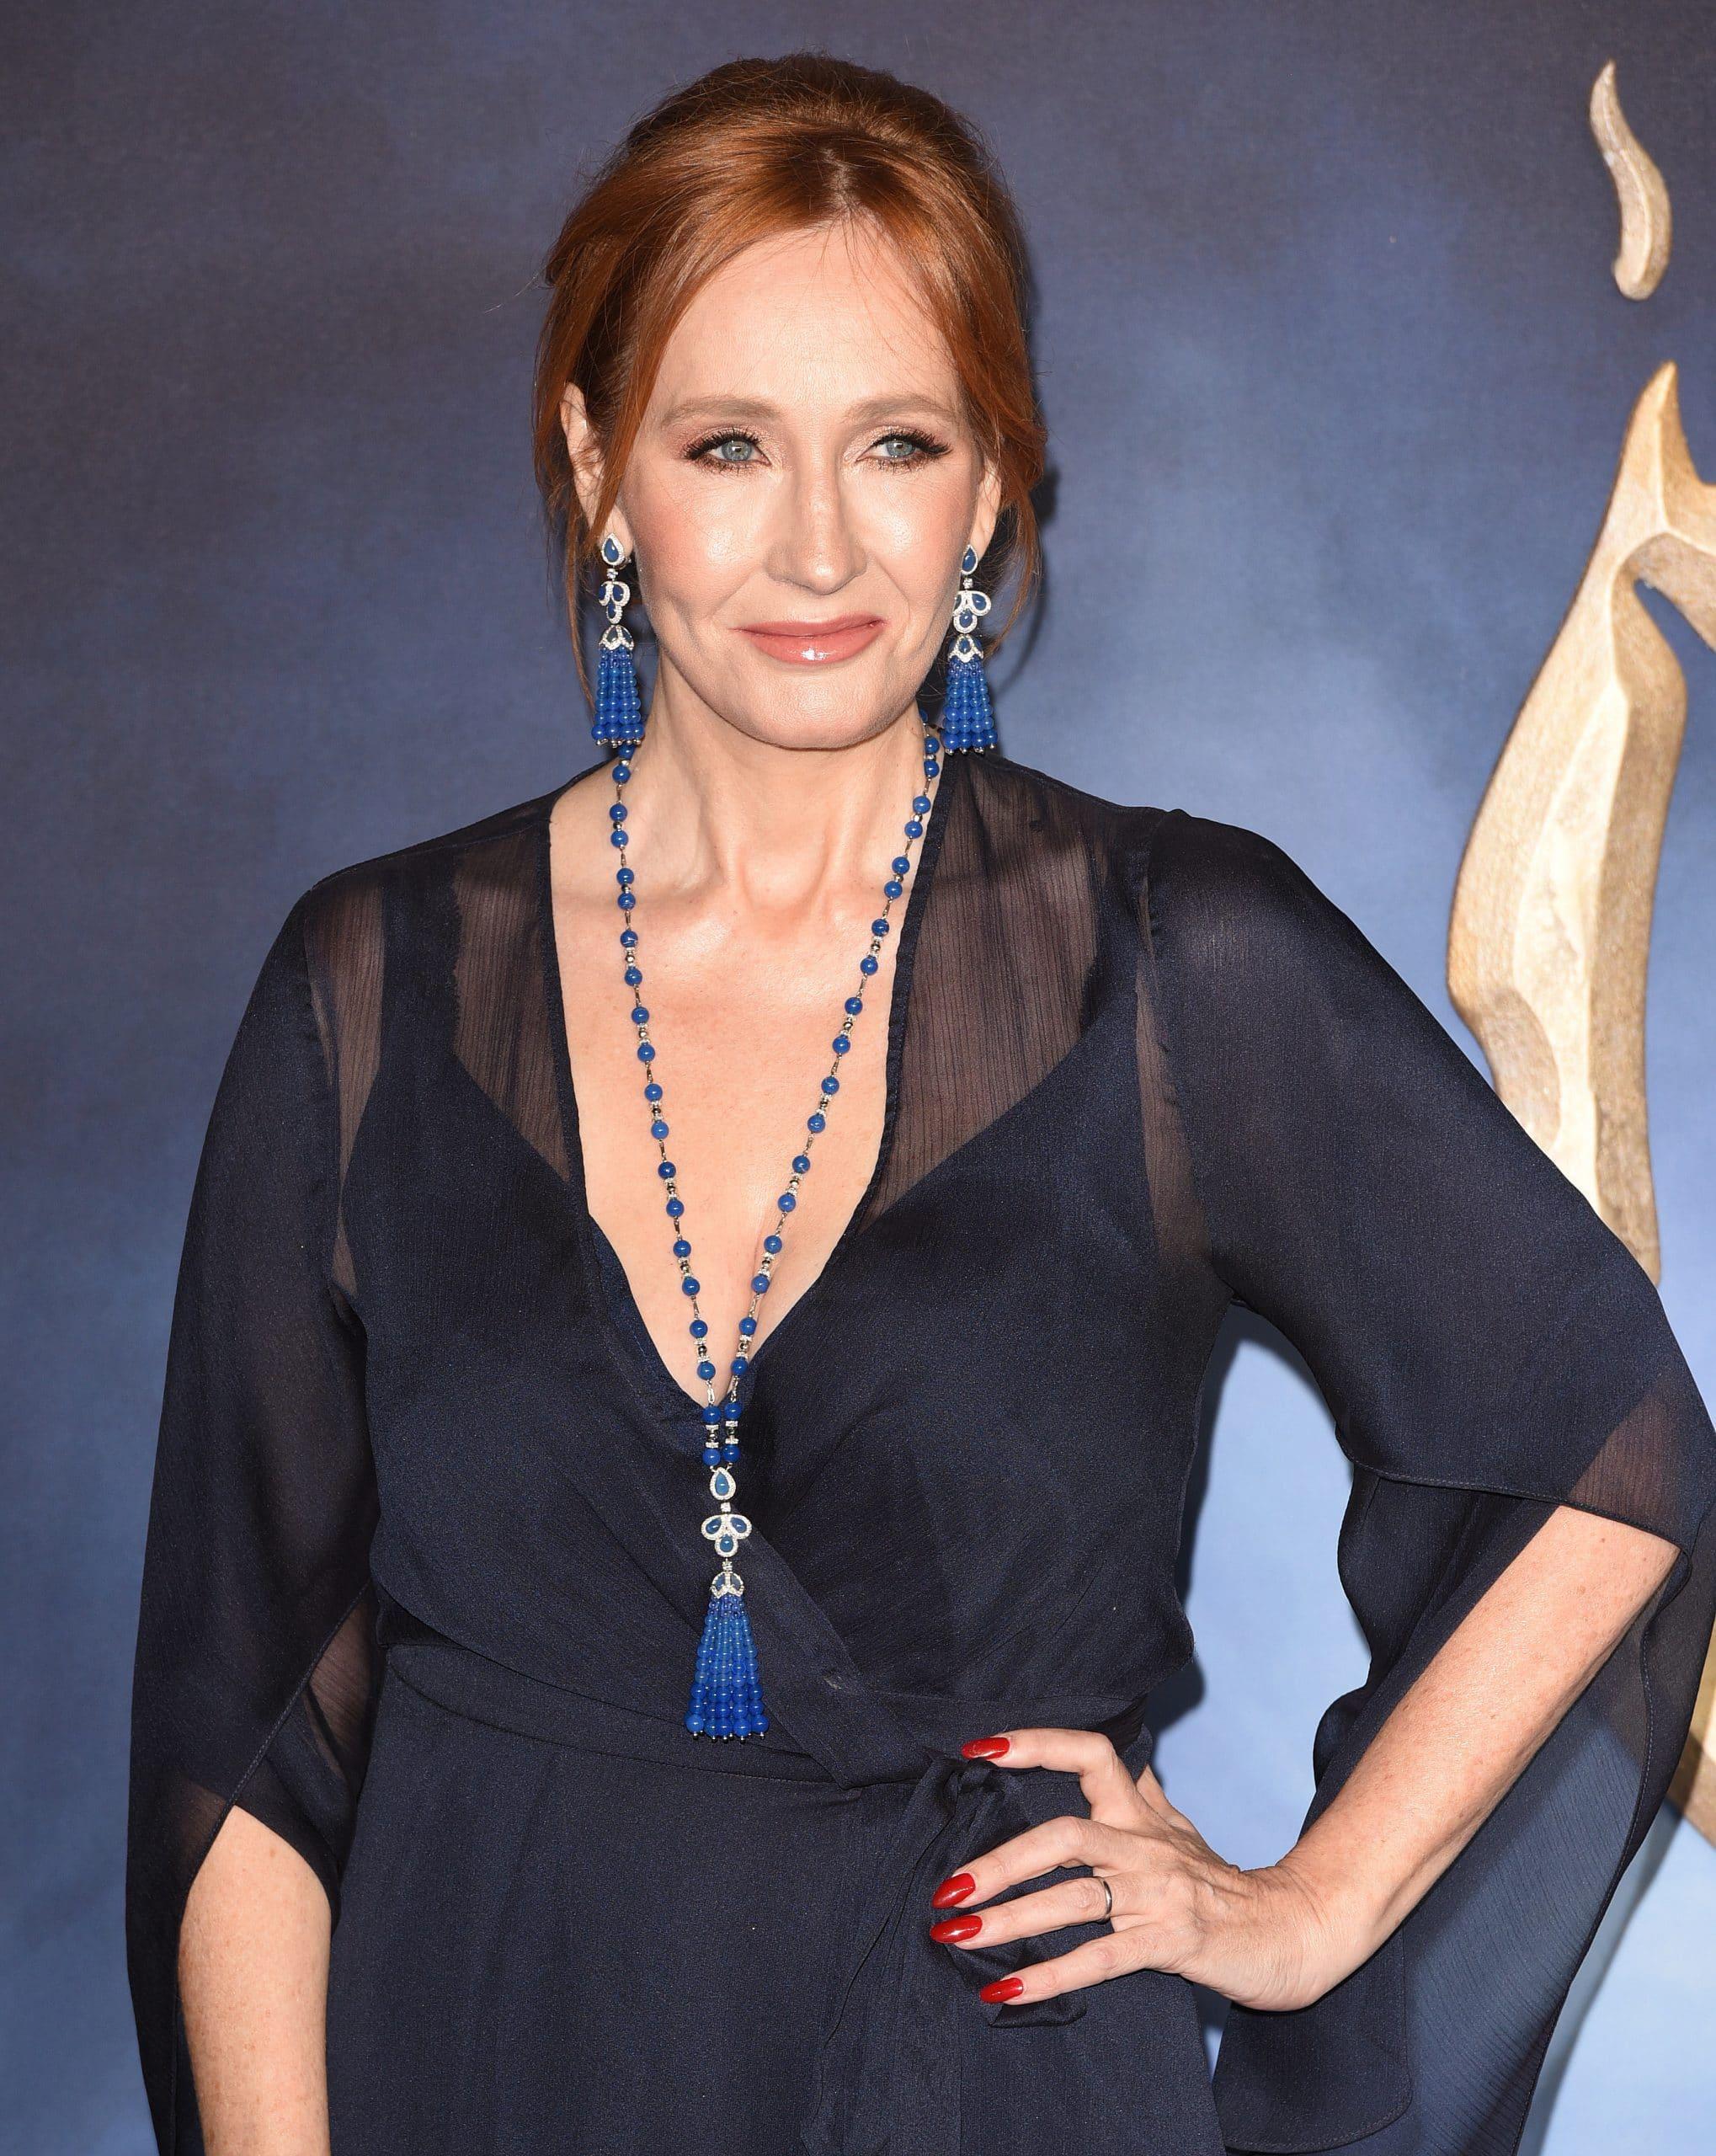 Cher's Son Chaz Bono Speaks Out Against Author J.K. Rowling's Transgender Comments